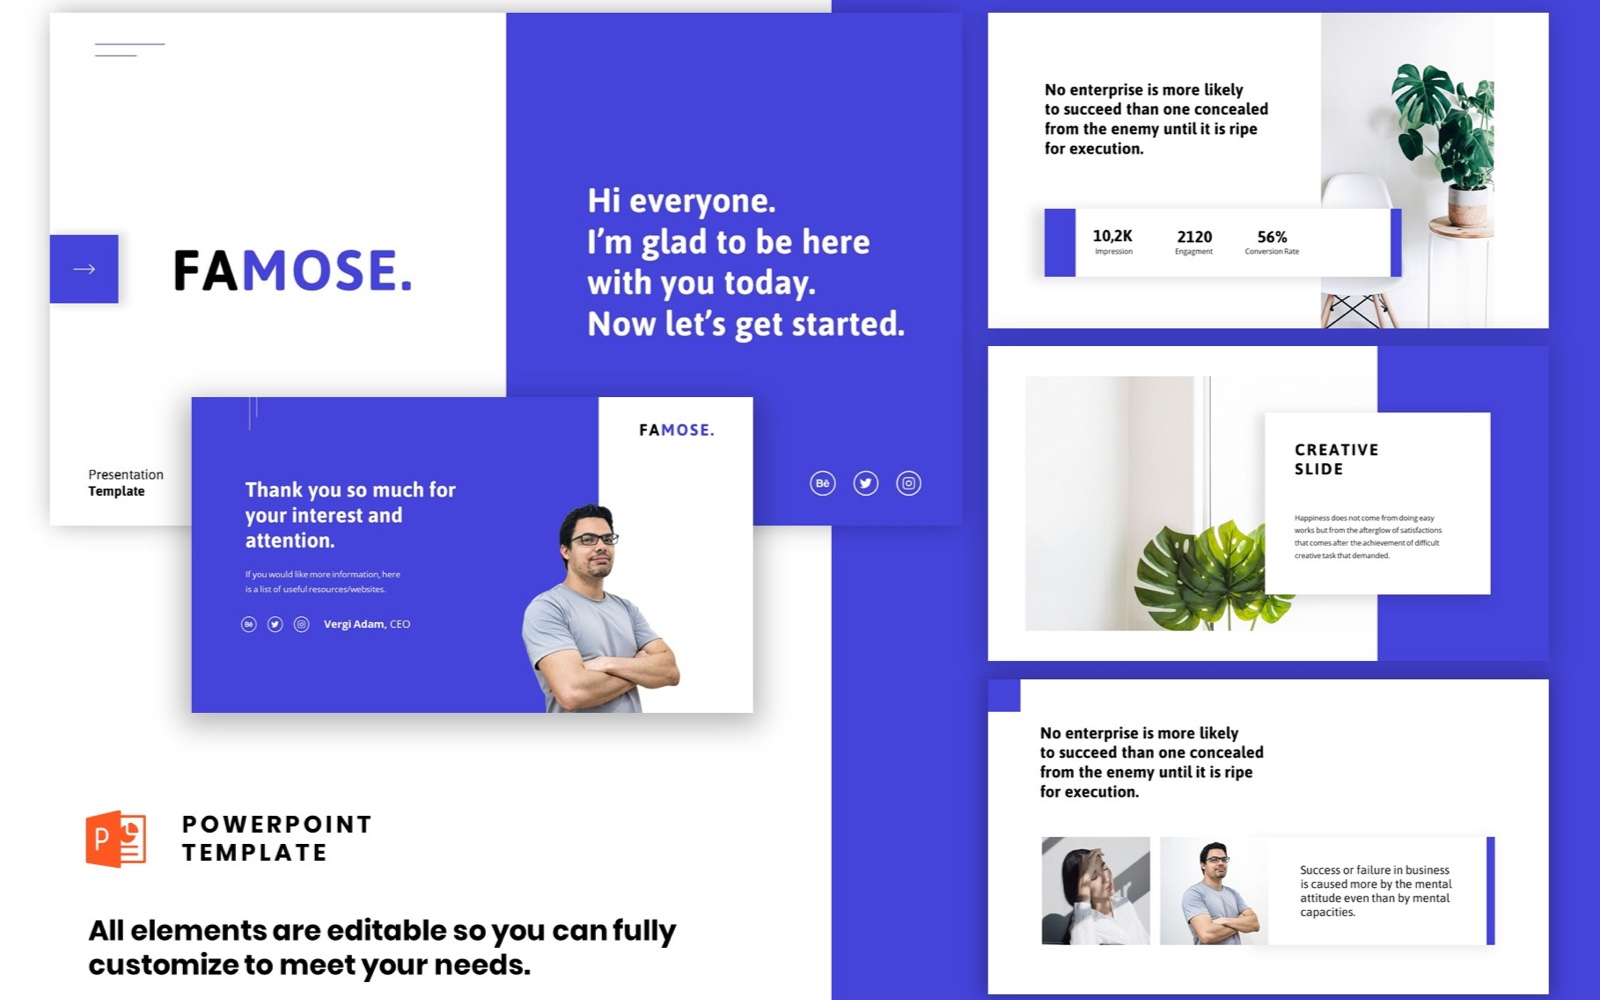 Szablon PowerPoint Corporate Startup - Clean Powerpoint #102242